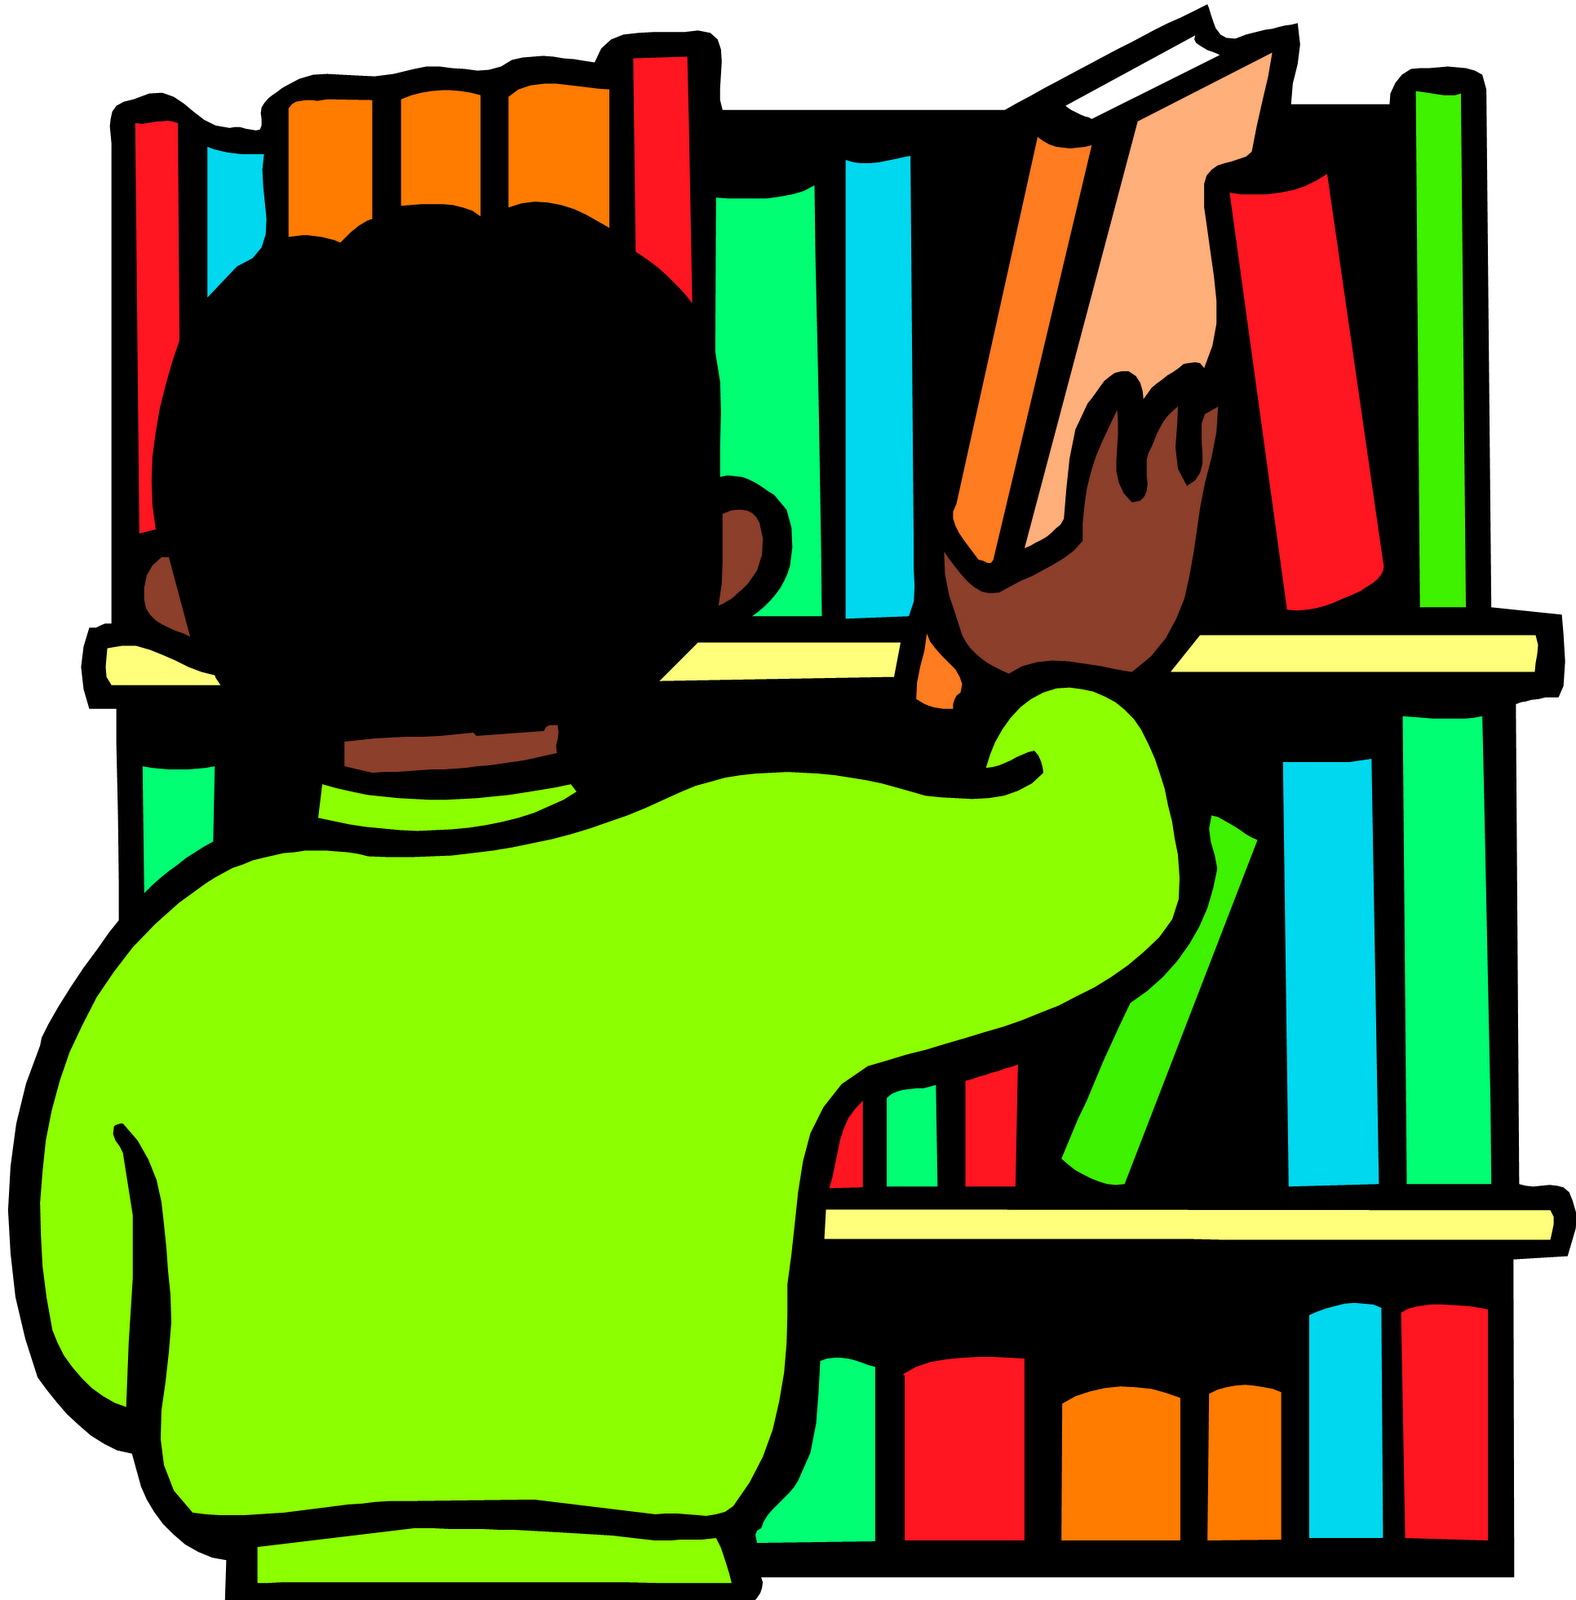 Clipart book shelf clip art free library Dewey Decimal Classification Library classification Librarian School ... clip art free library